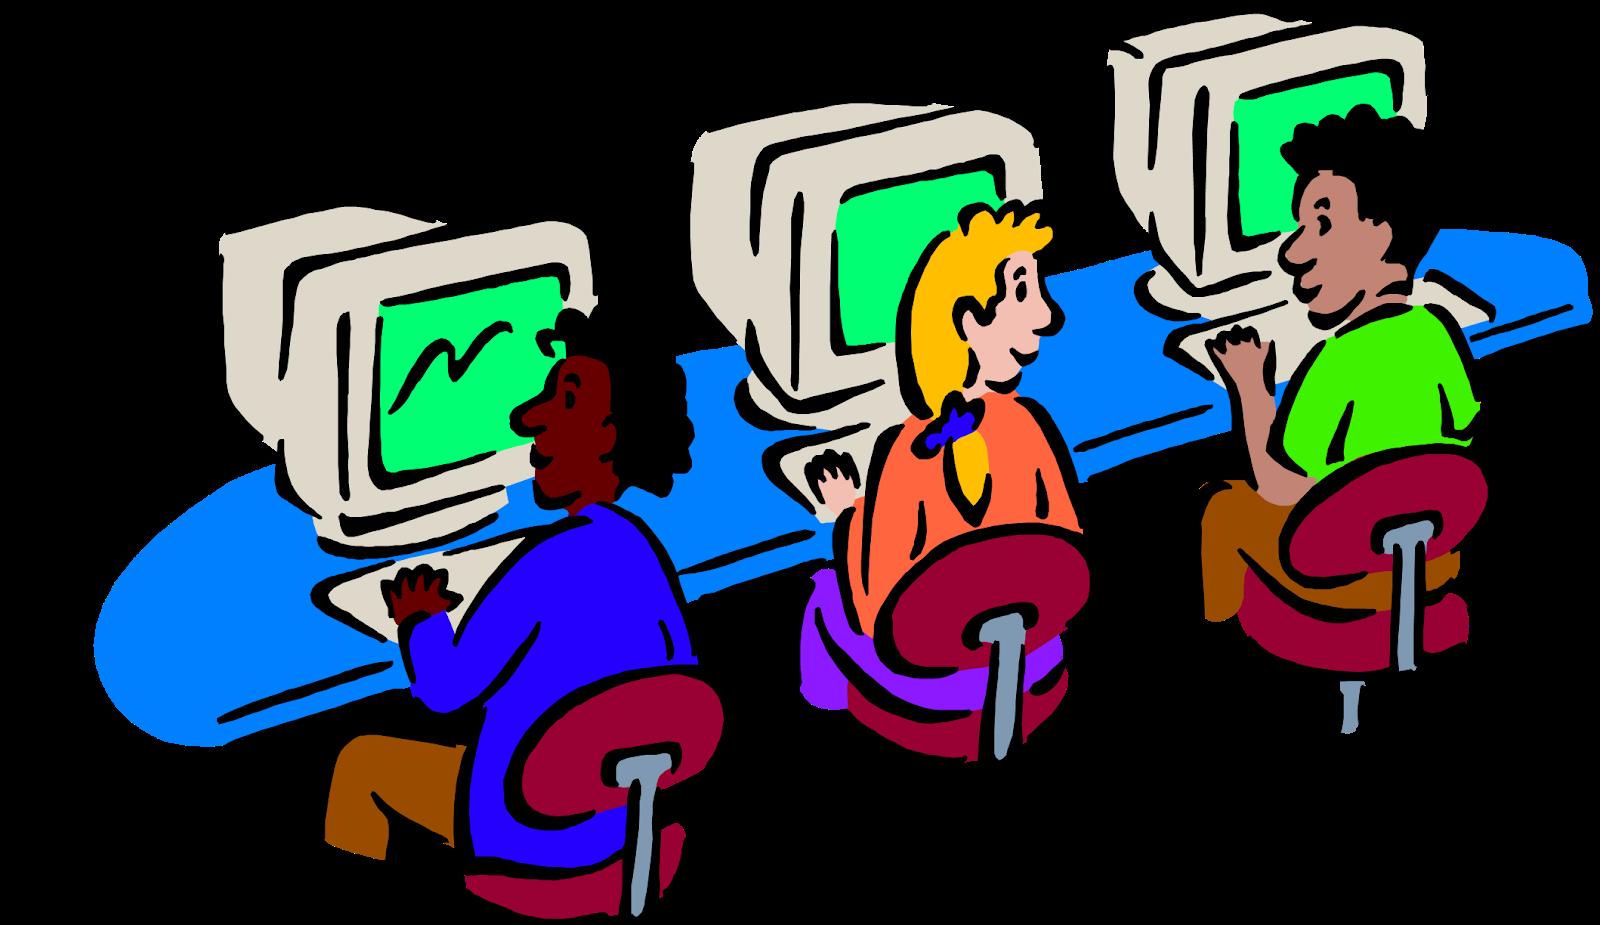 Btrgrad kidscomputerspng space. Working clipart independent work